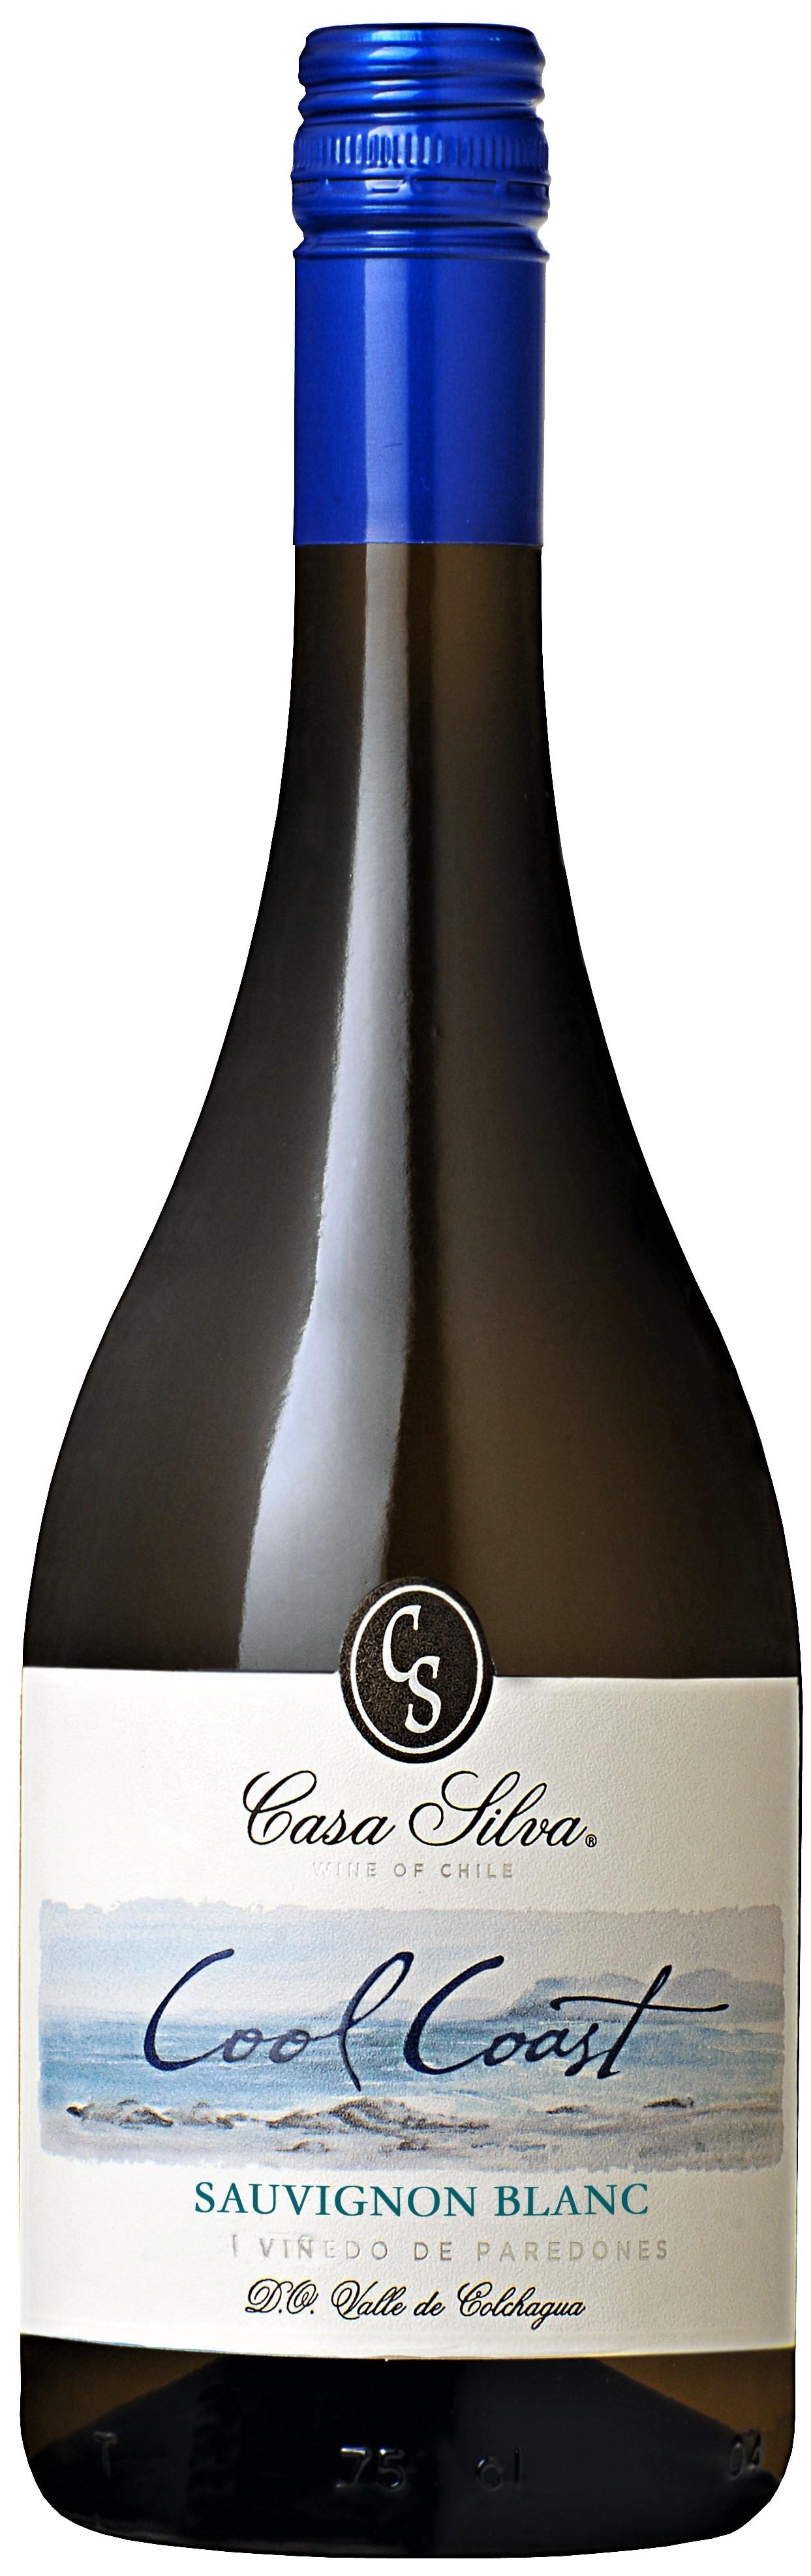 Caudalia wine box enero 2019 Sauvignon Blanc